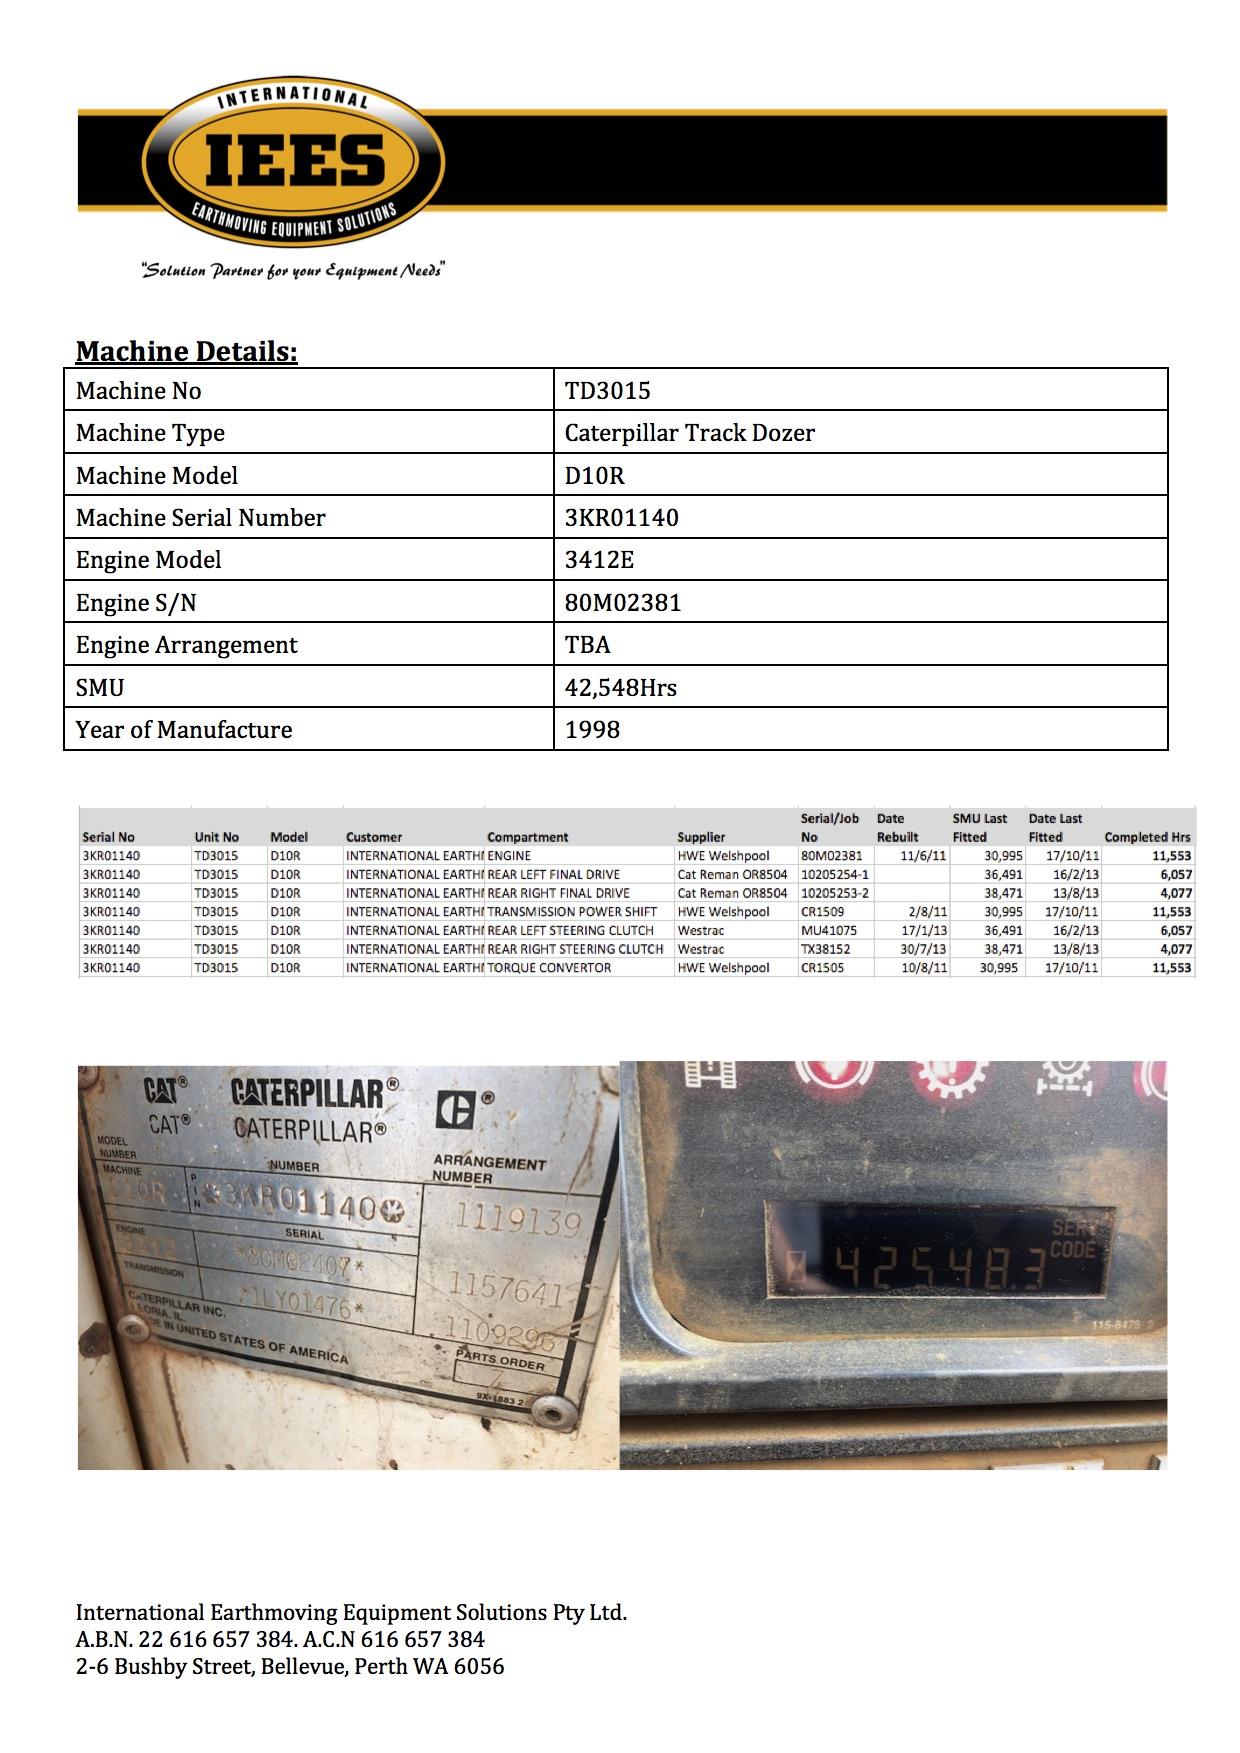 1998 D10R | About | Bellevue | International Earthmoving